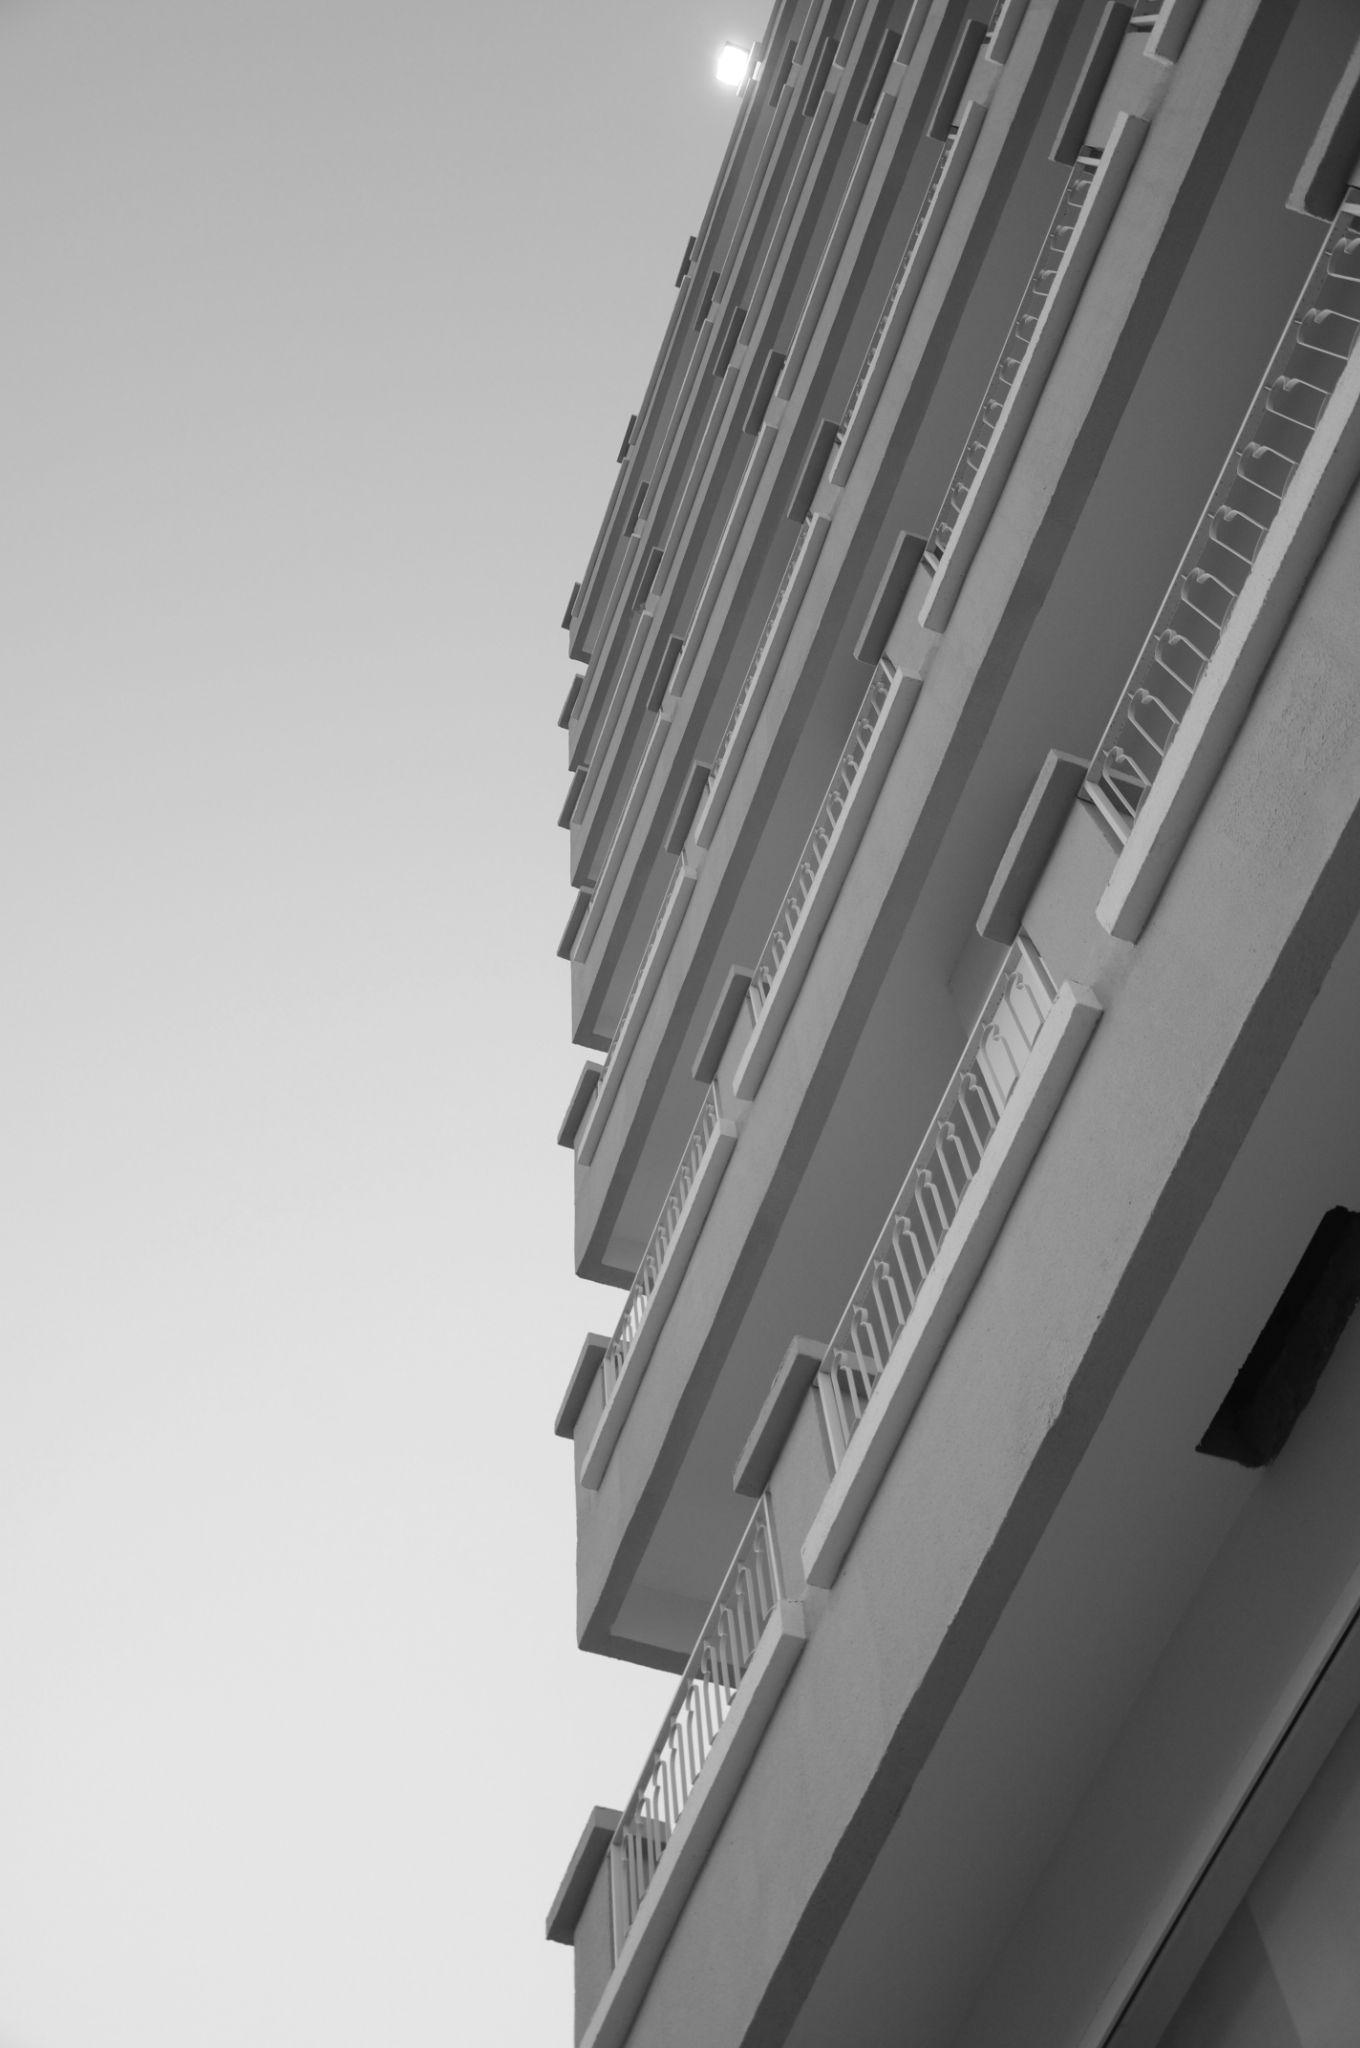 Building by jao.abenoja